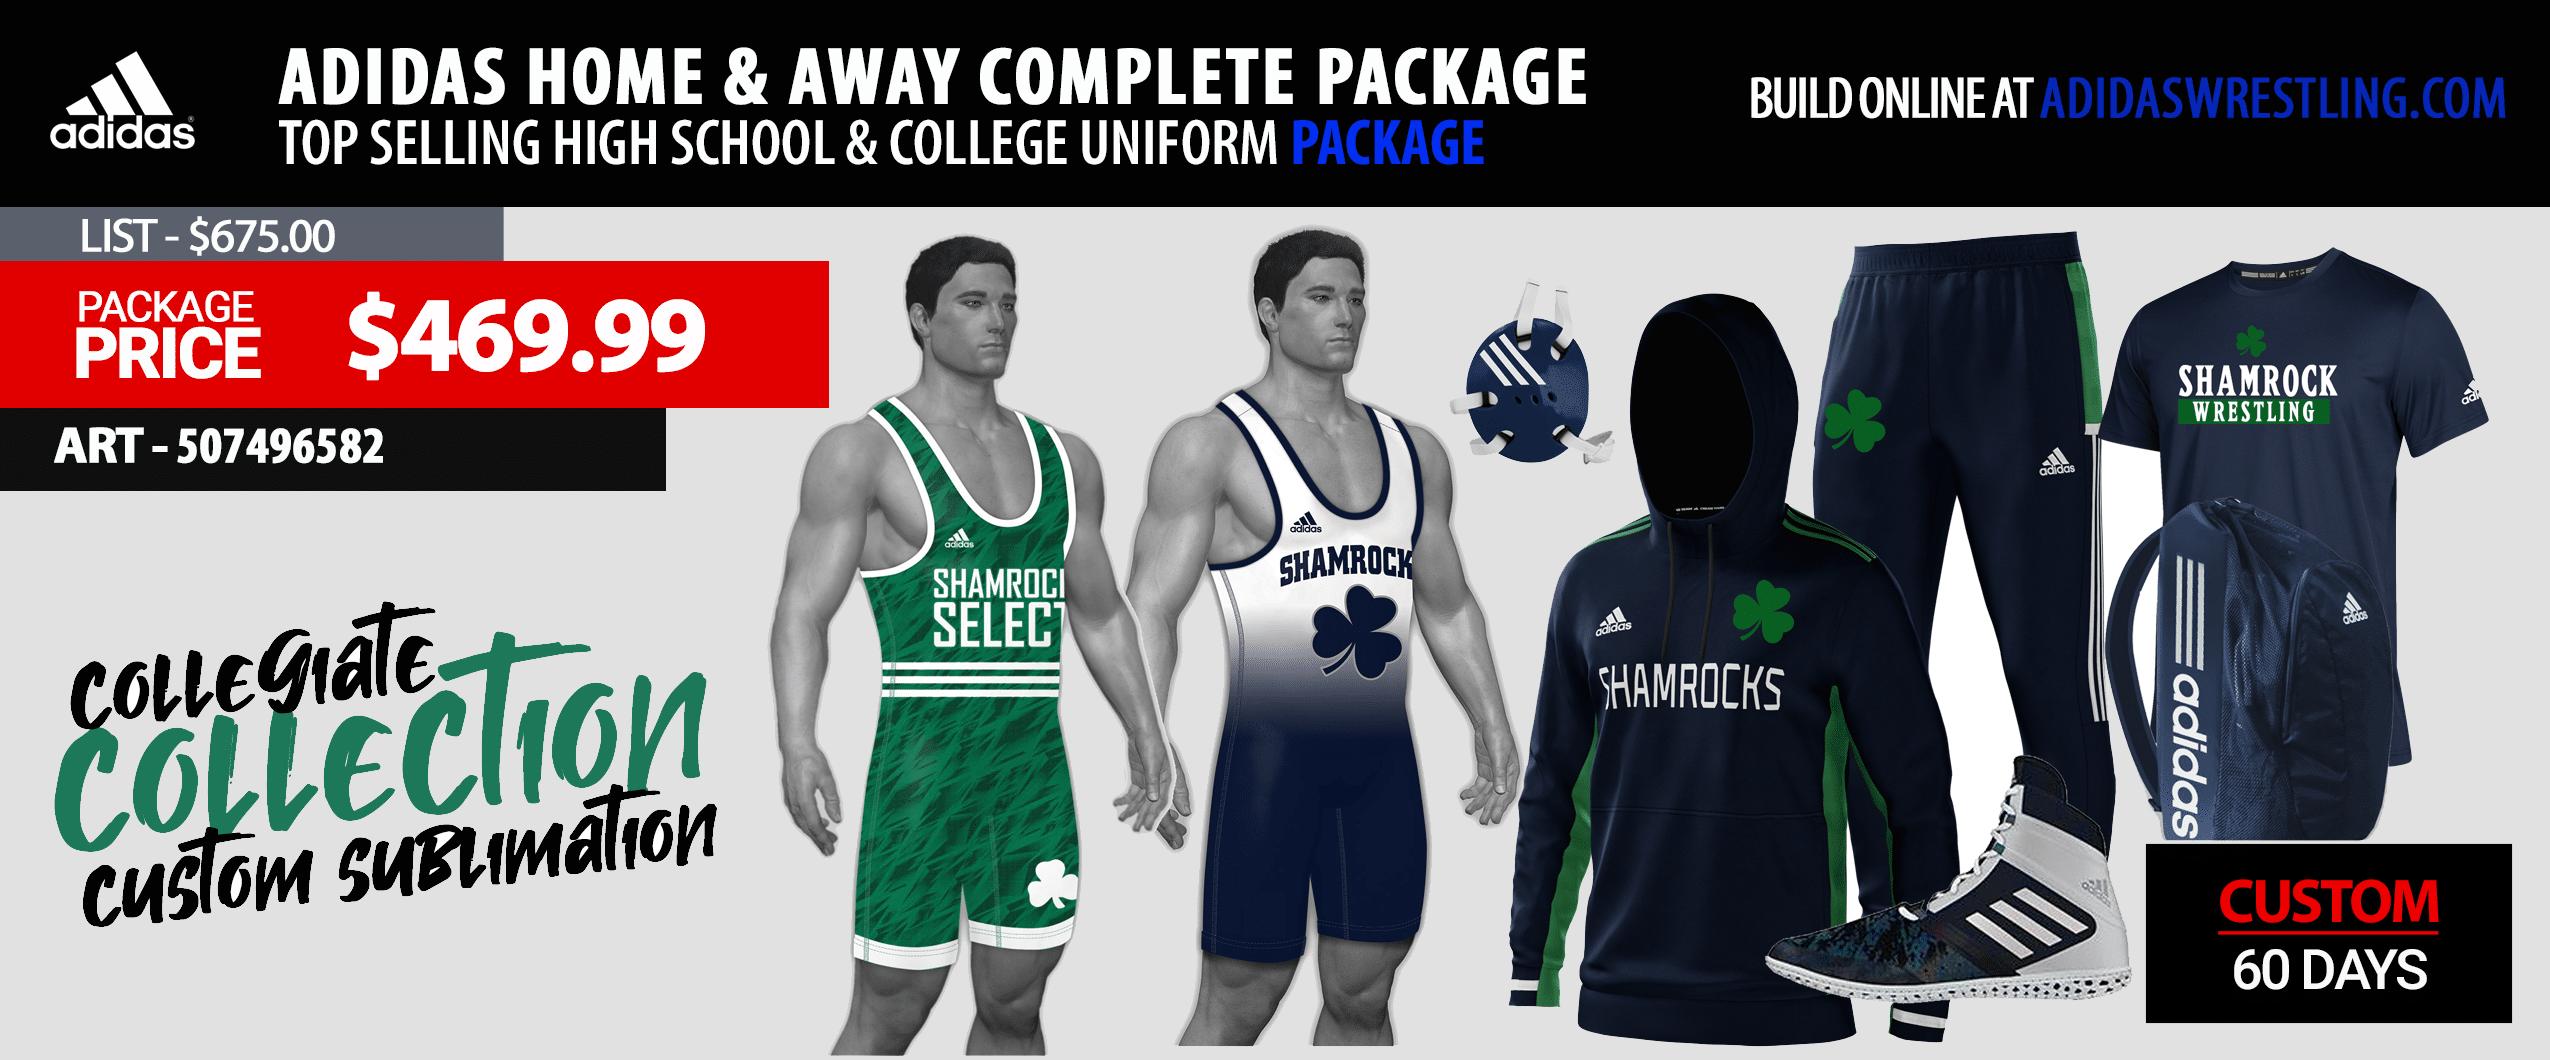 Adidas Custom Bulldogs Mens Pro Basketball Jersey Package